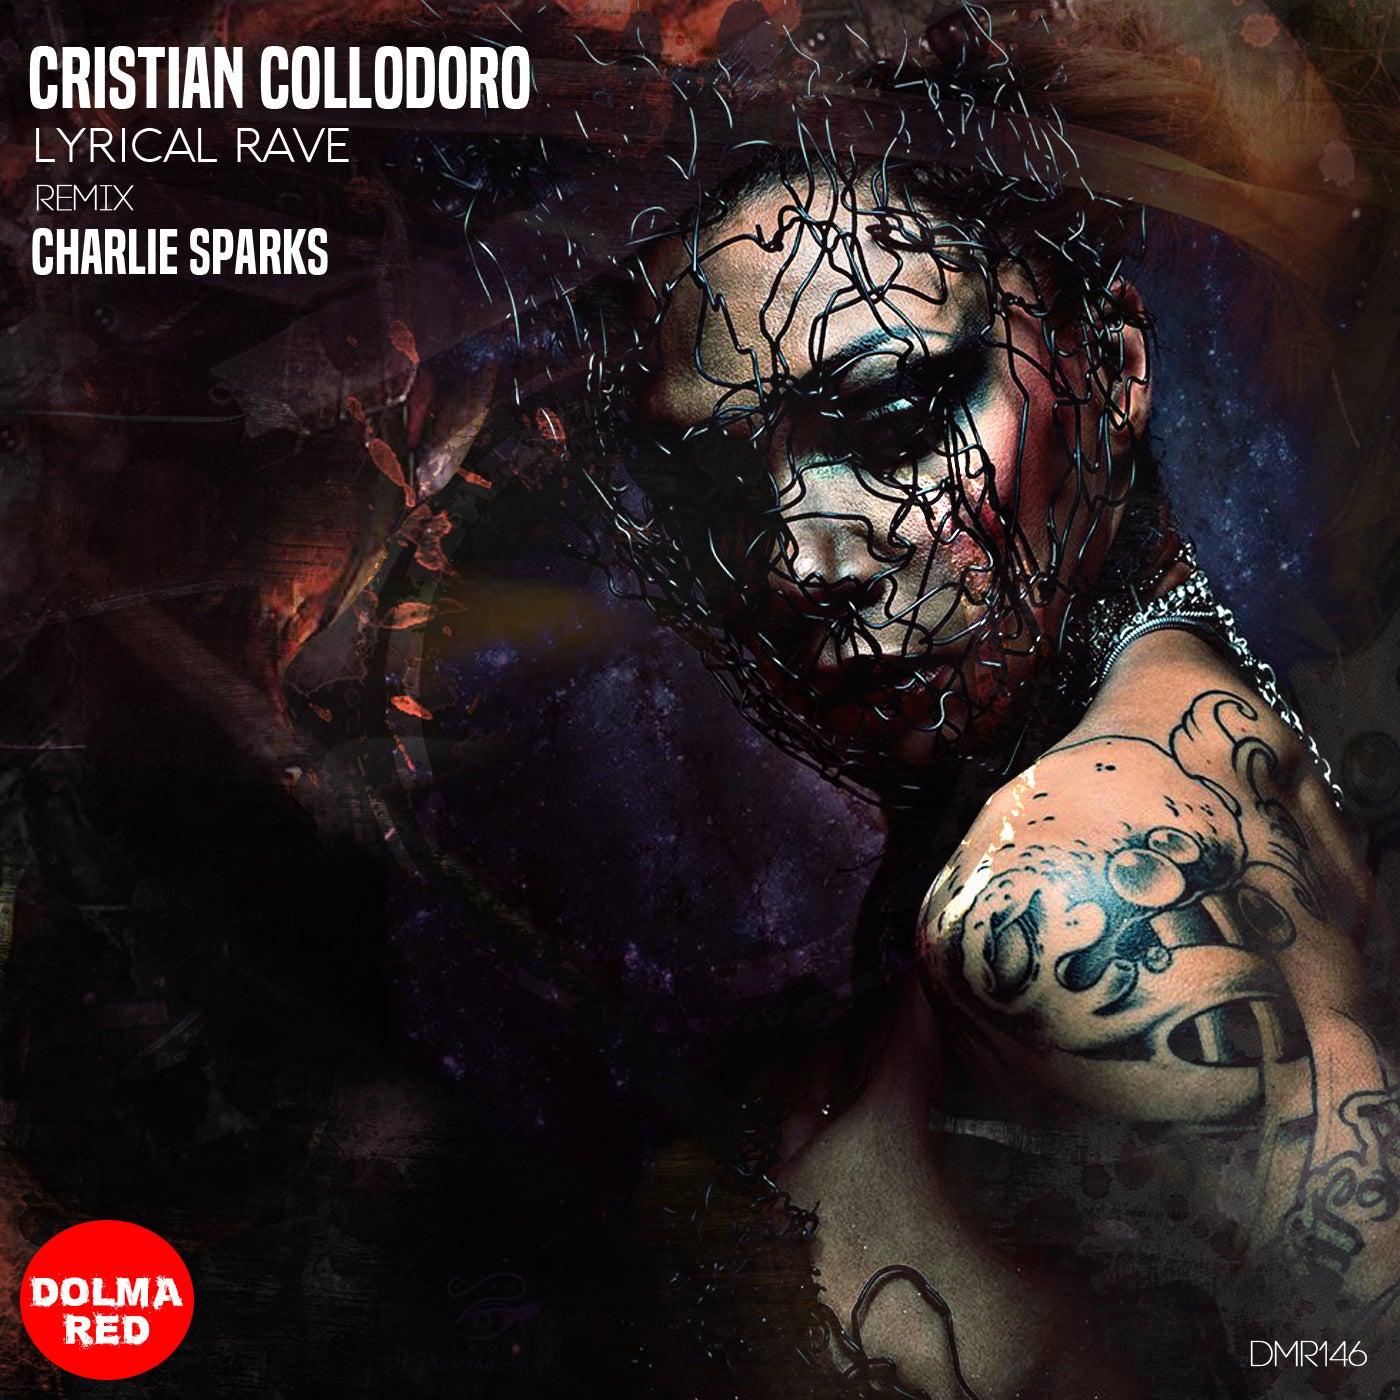 Lyrical Rave (Charlie Sparks Remix)